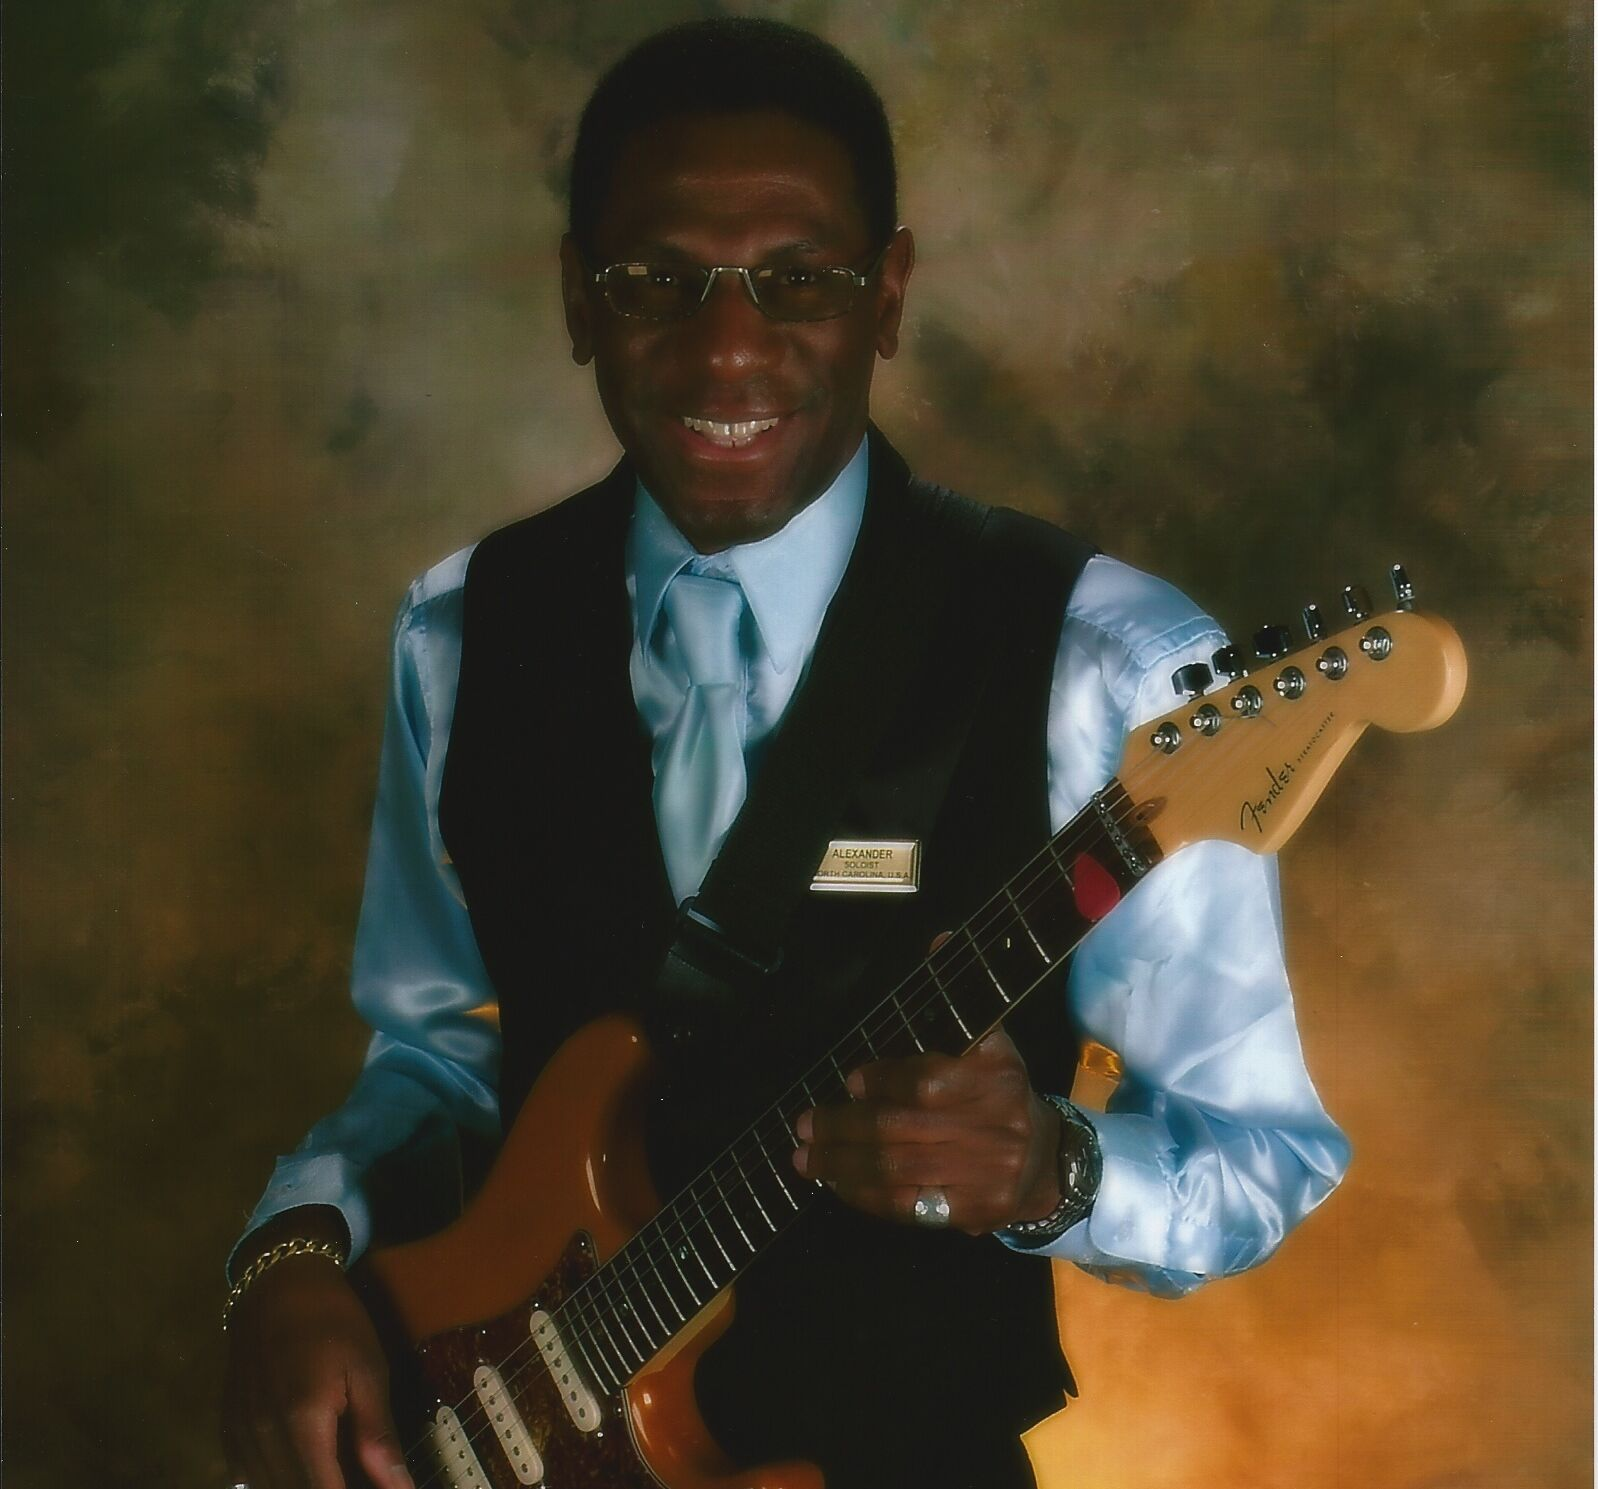 Alex Williams - One Man Band - Raleigh, NC